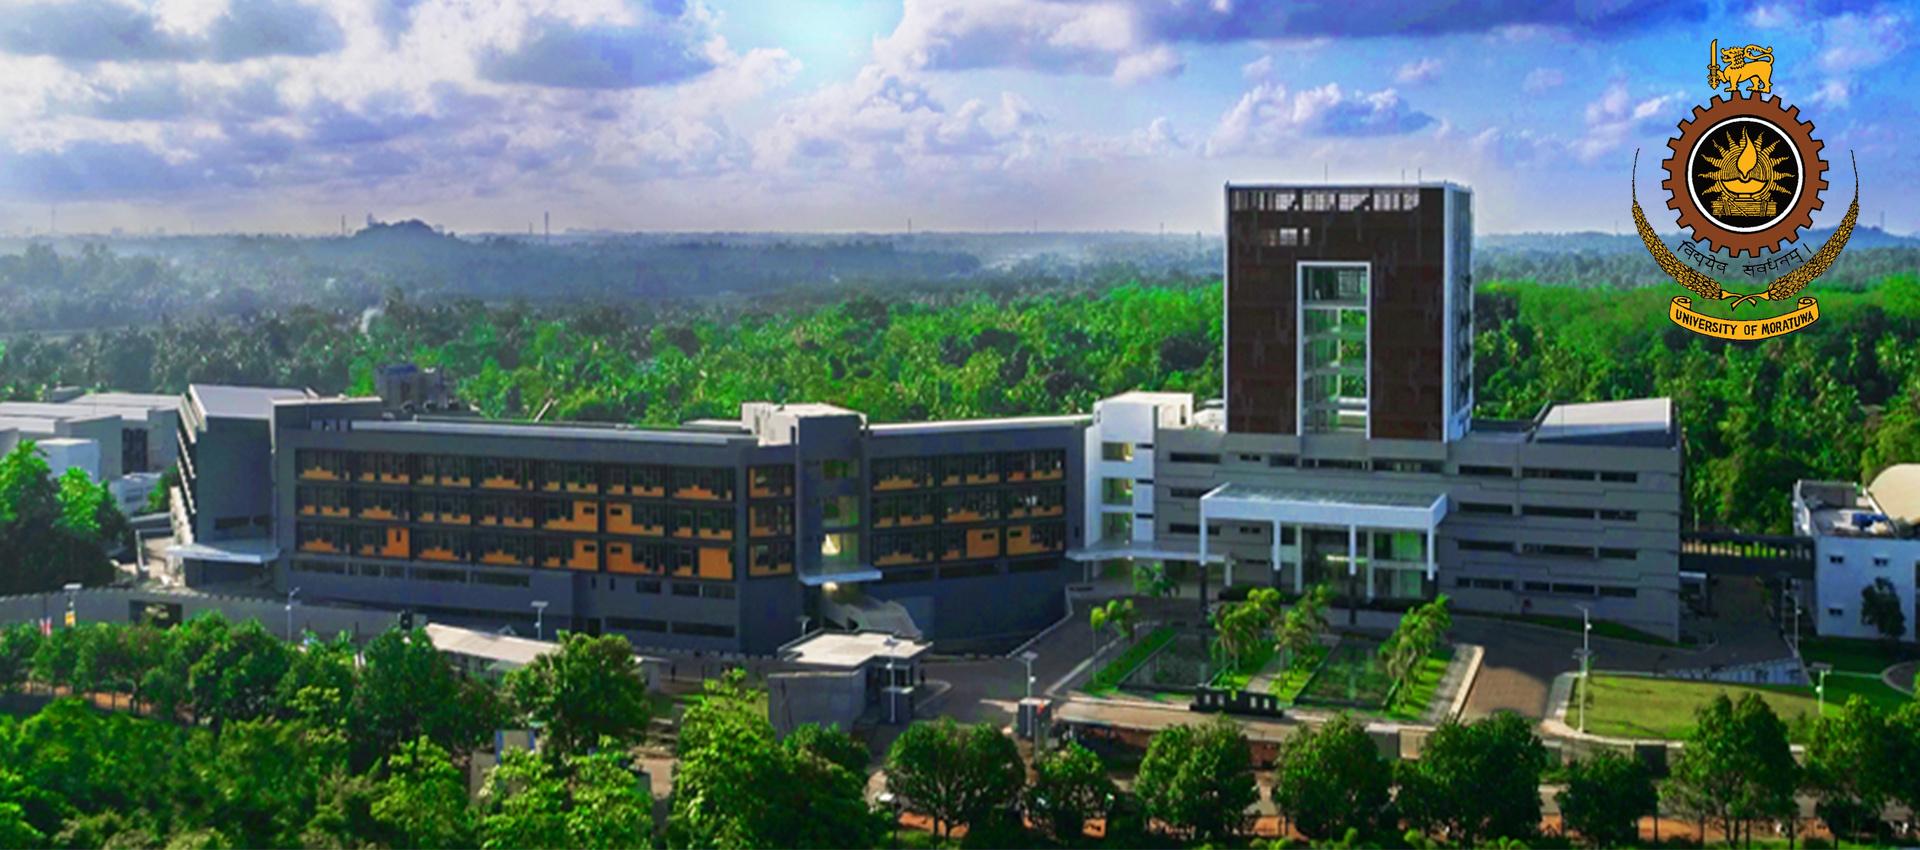 Yesman.lk - Cover Image - Institute of Technology University of Moratuwa - ITUM